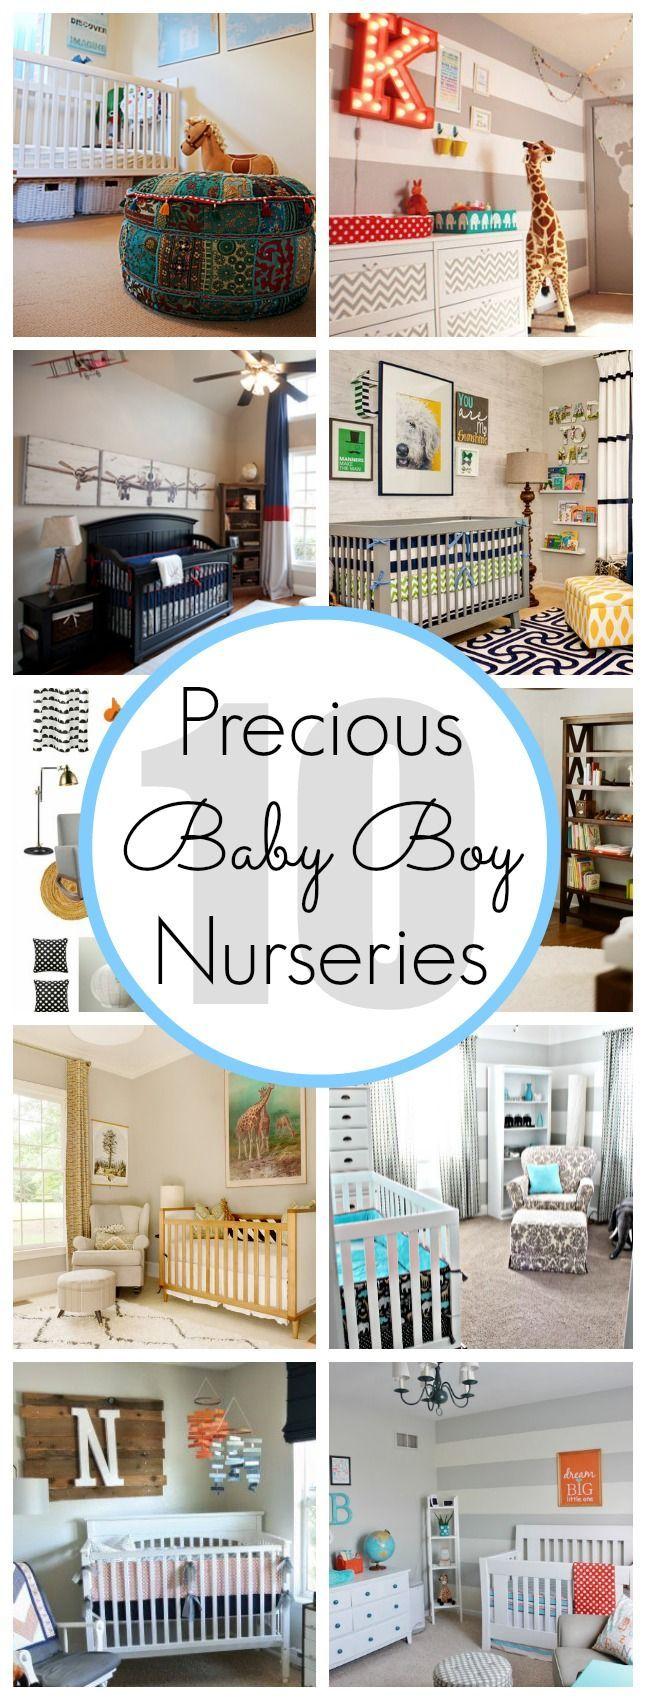 10 Precious Baby Boy Nursery Ideas - www.classyclutter.net preparing for pregnancy prepar for pregnancy #baby #pregnancy